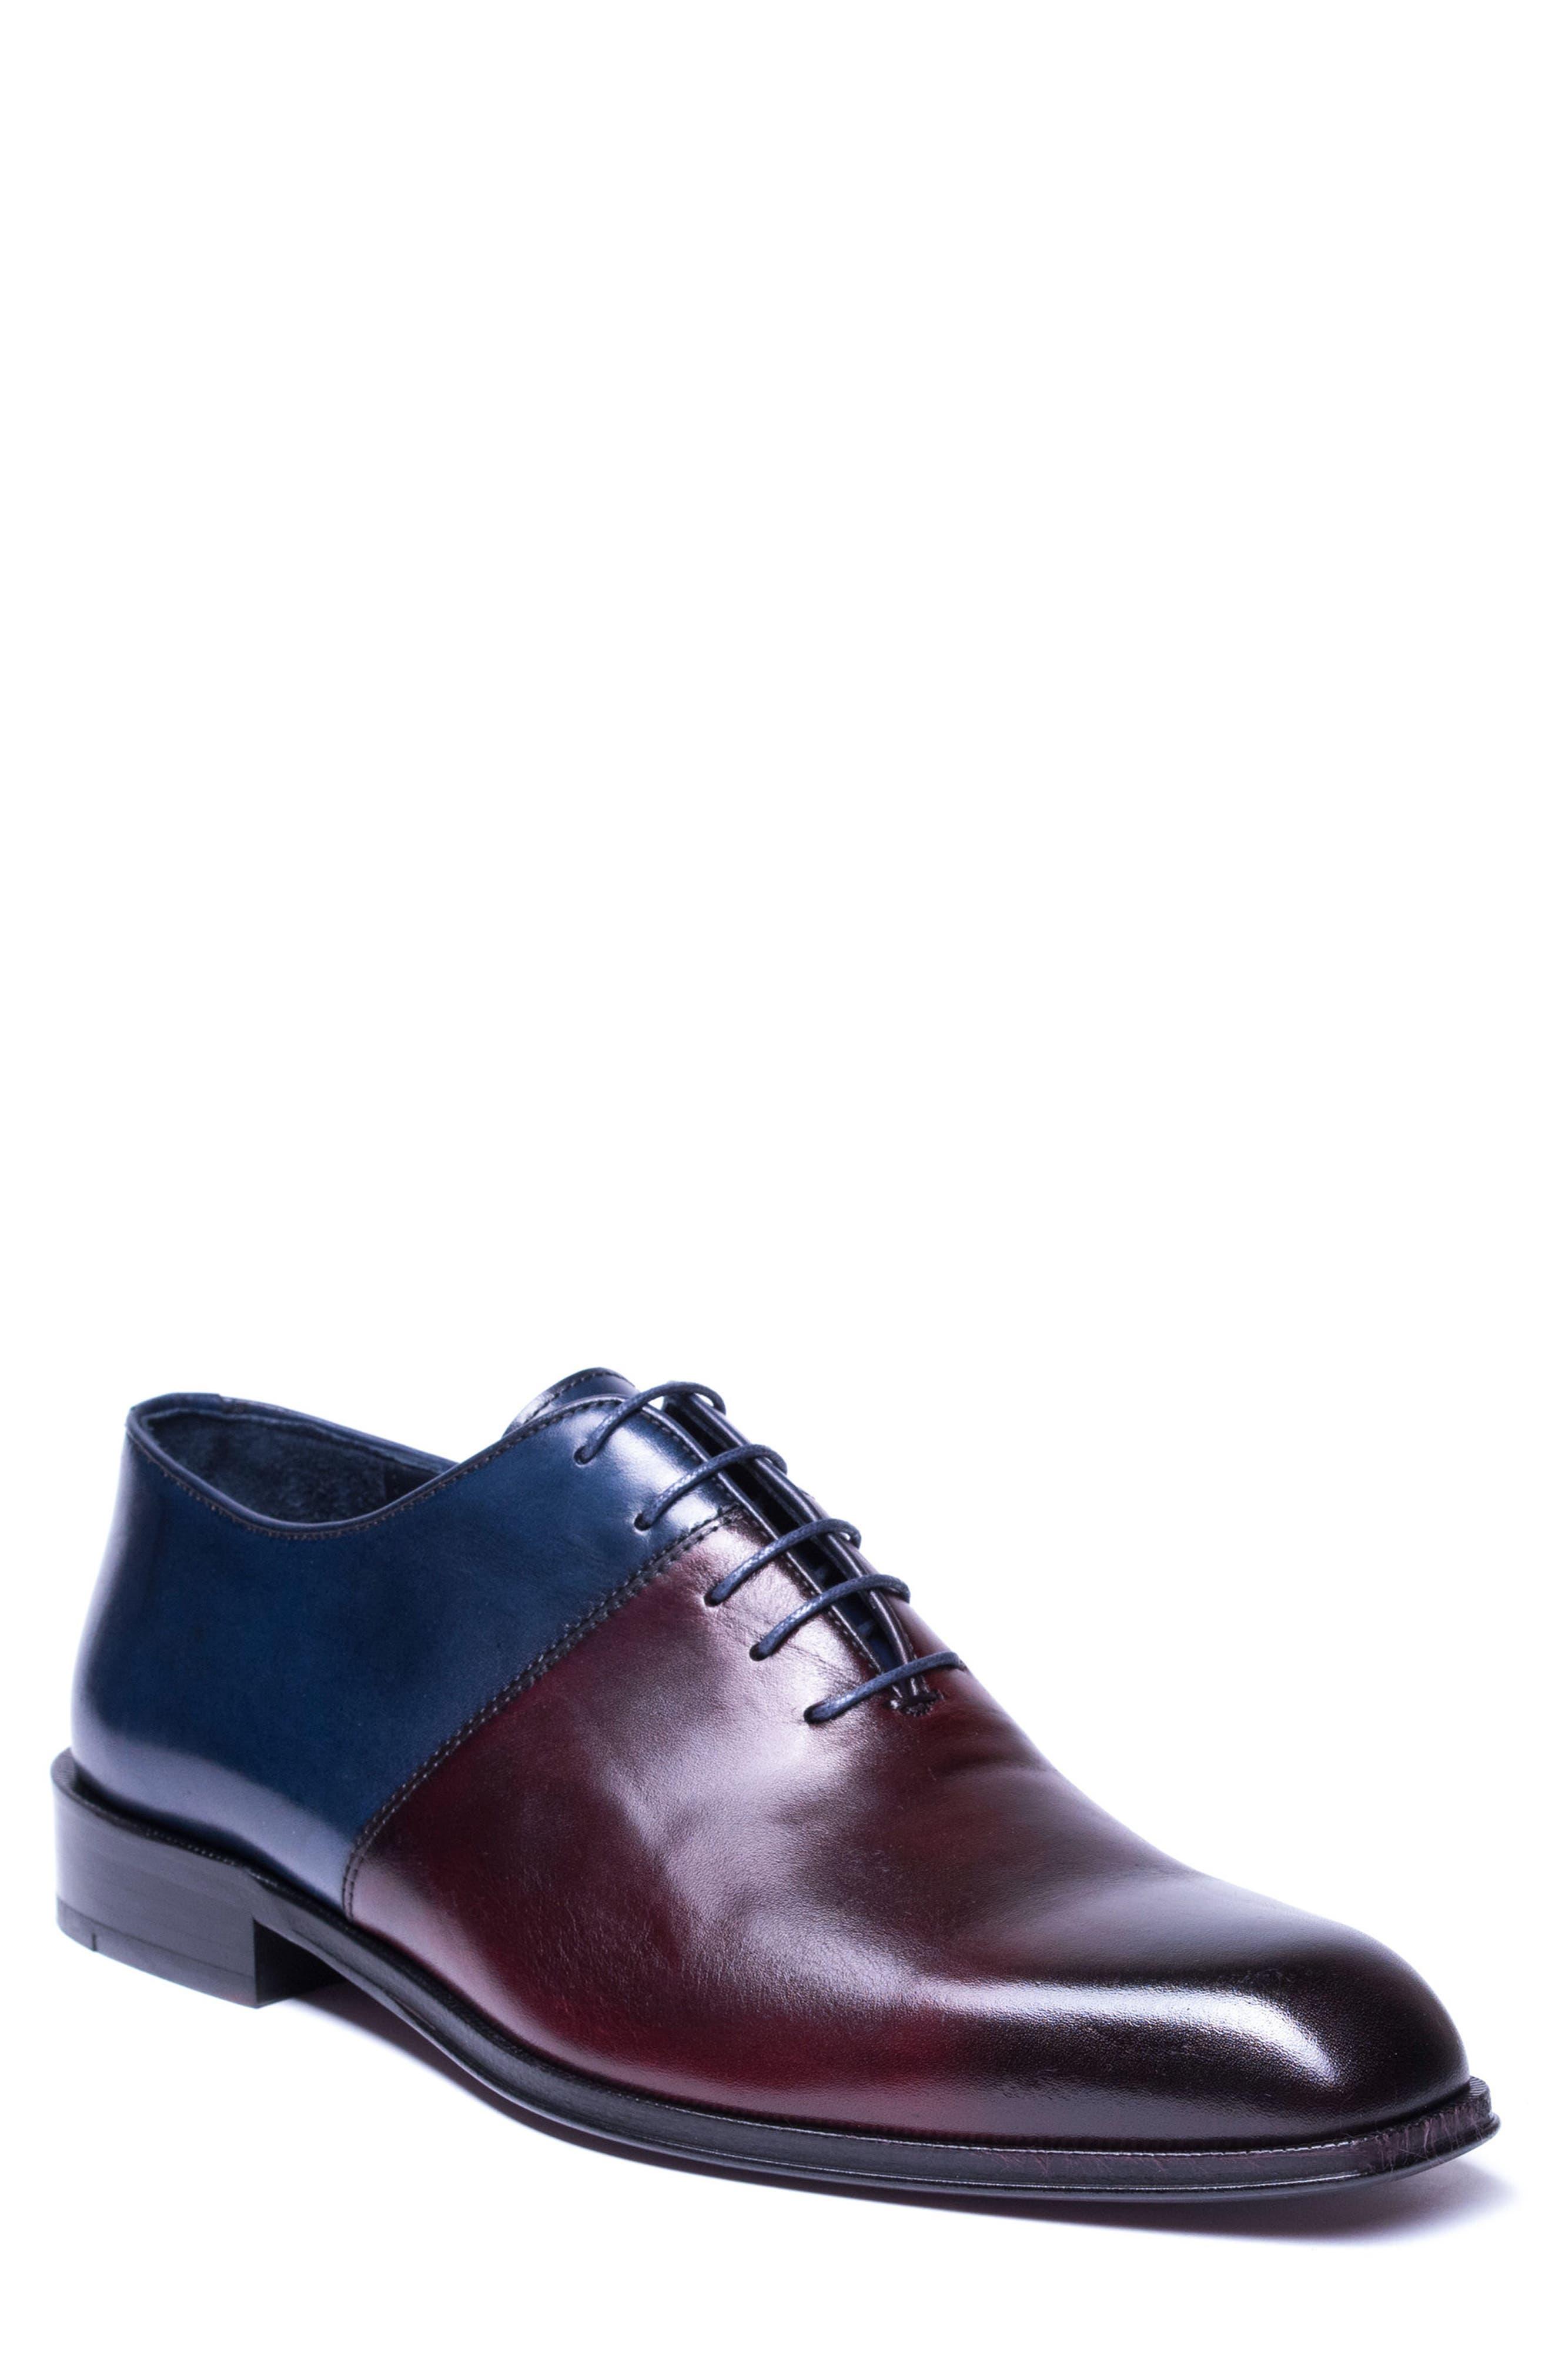 Wyatt Colorblocked Whole Cut Shoe,                             Main thumbnail 1, color,                             Burgundy Leather